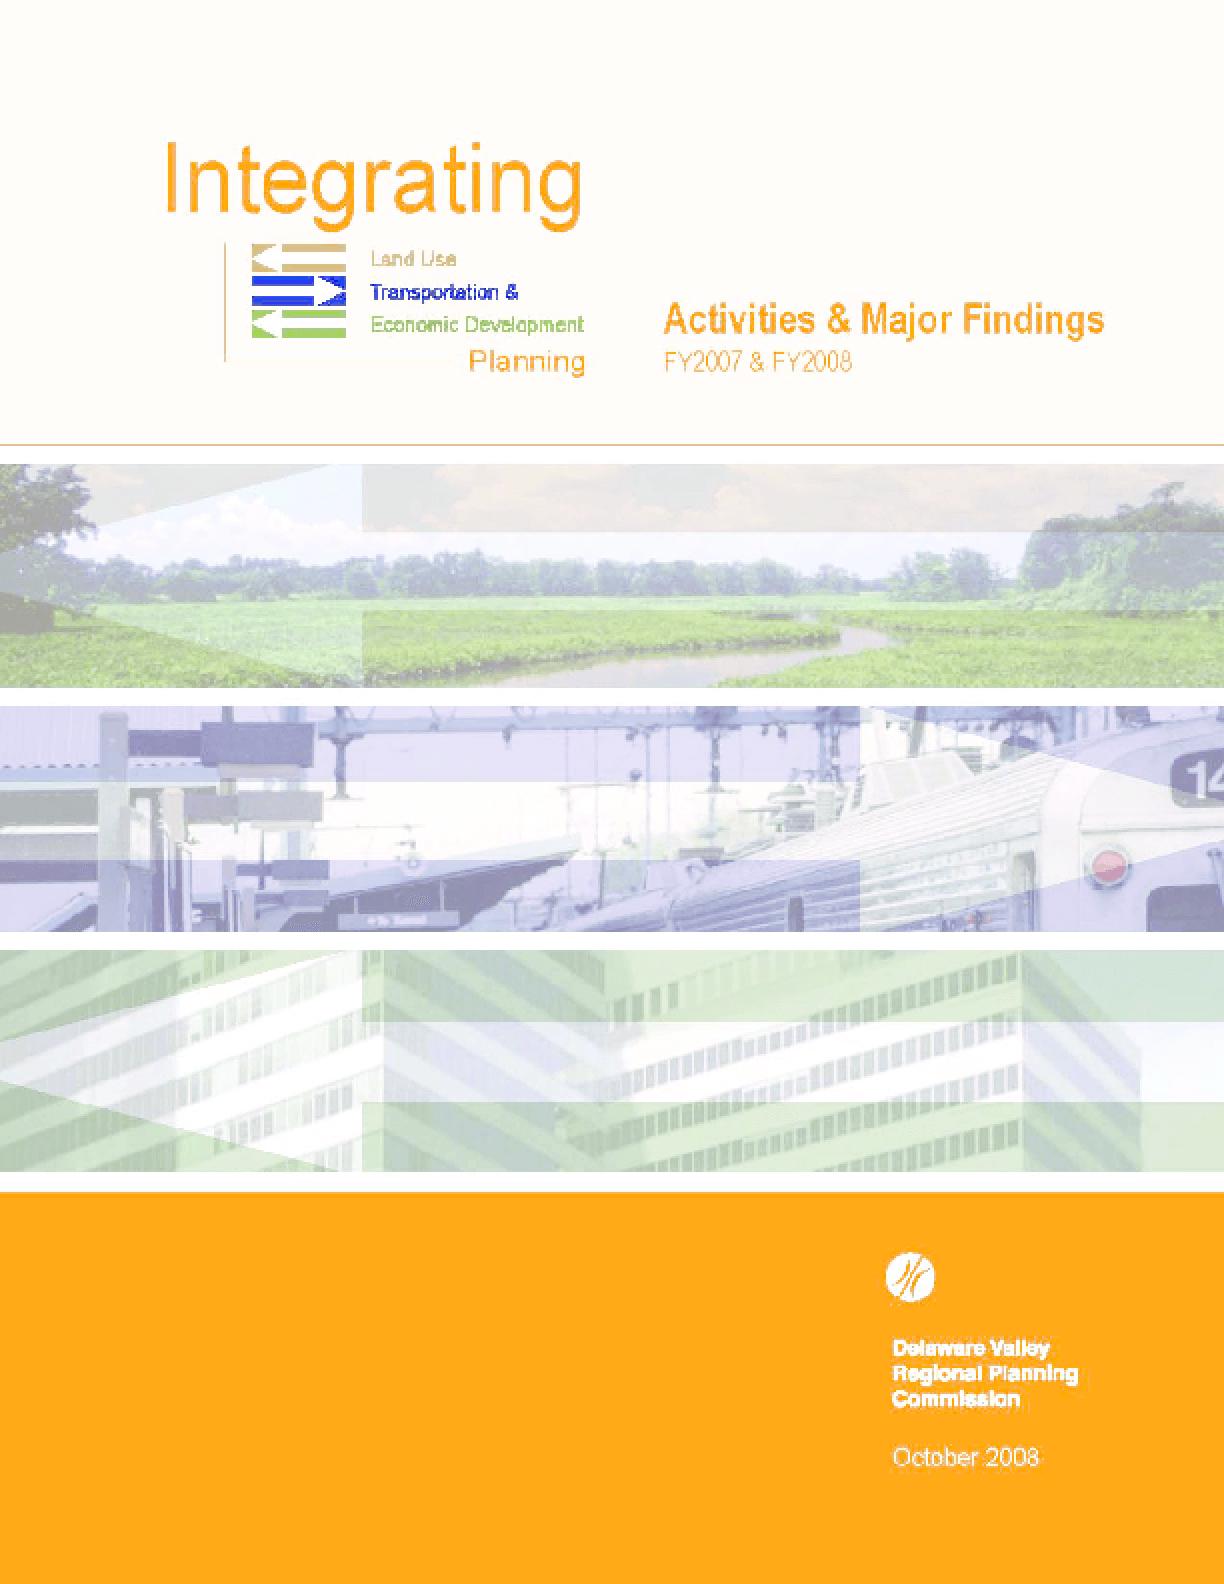 Integrating Land Use Transportation & Economic Development